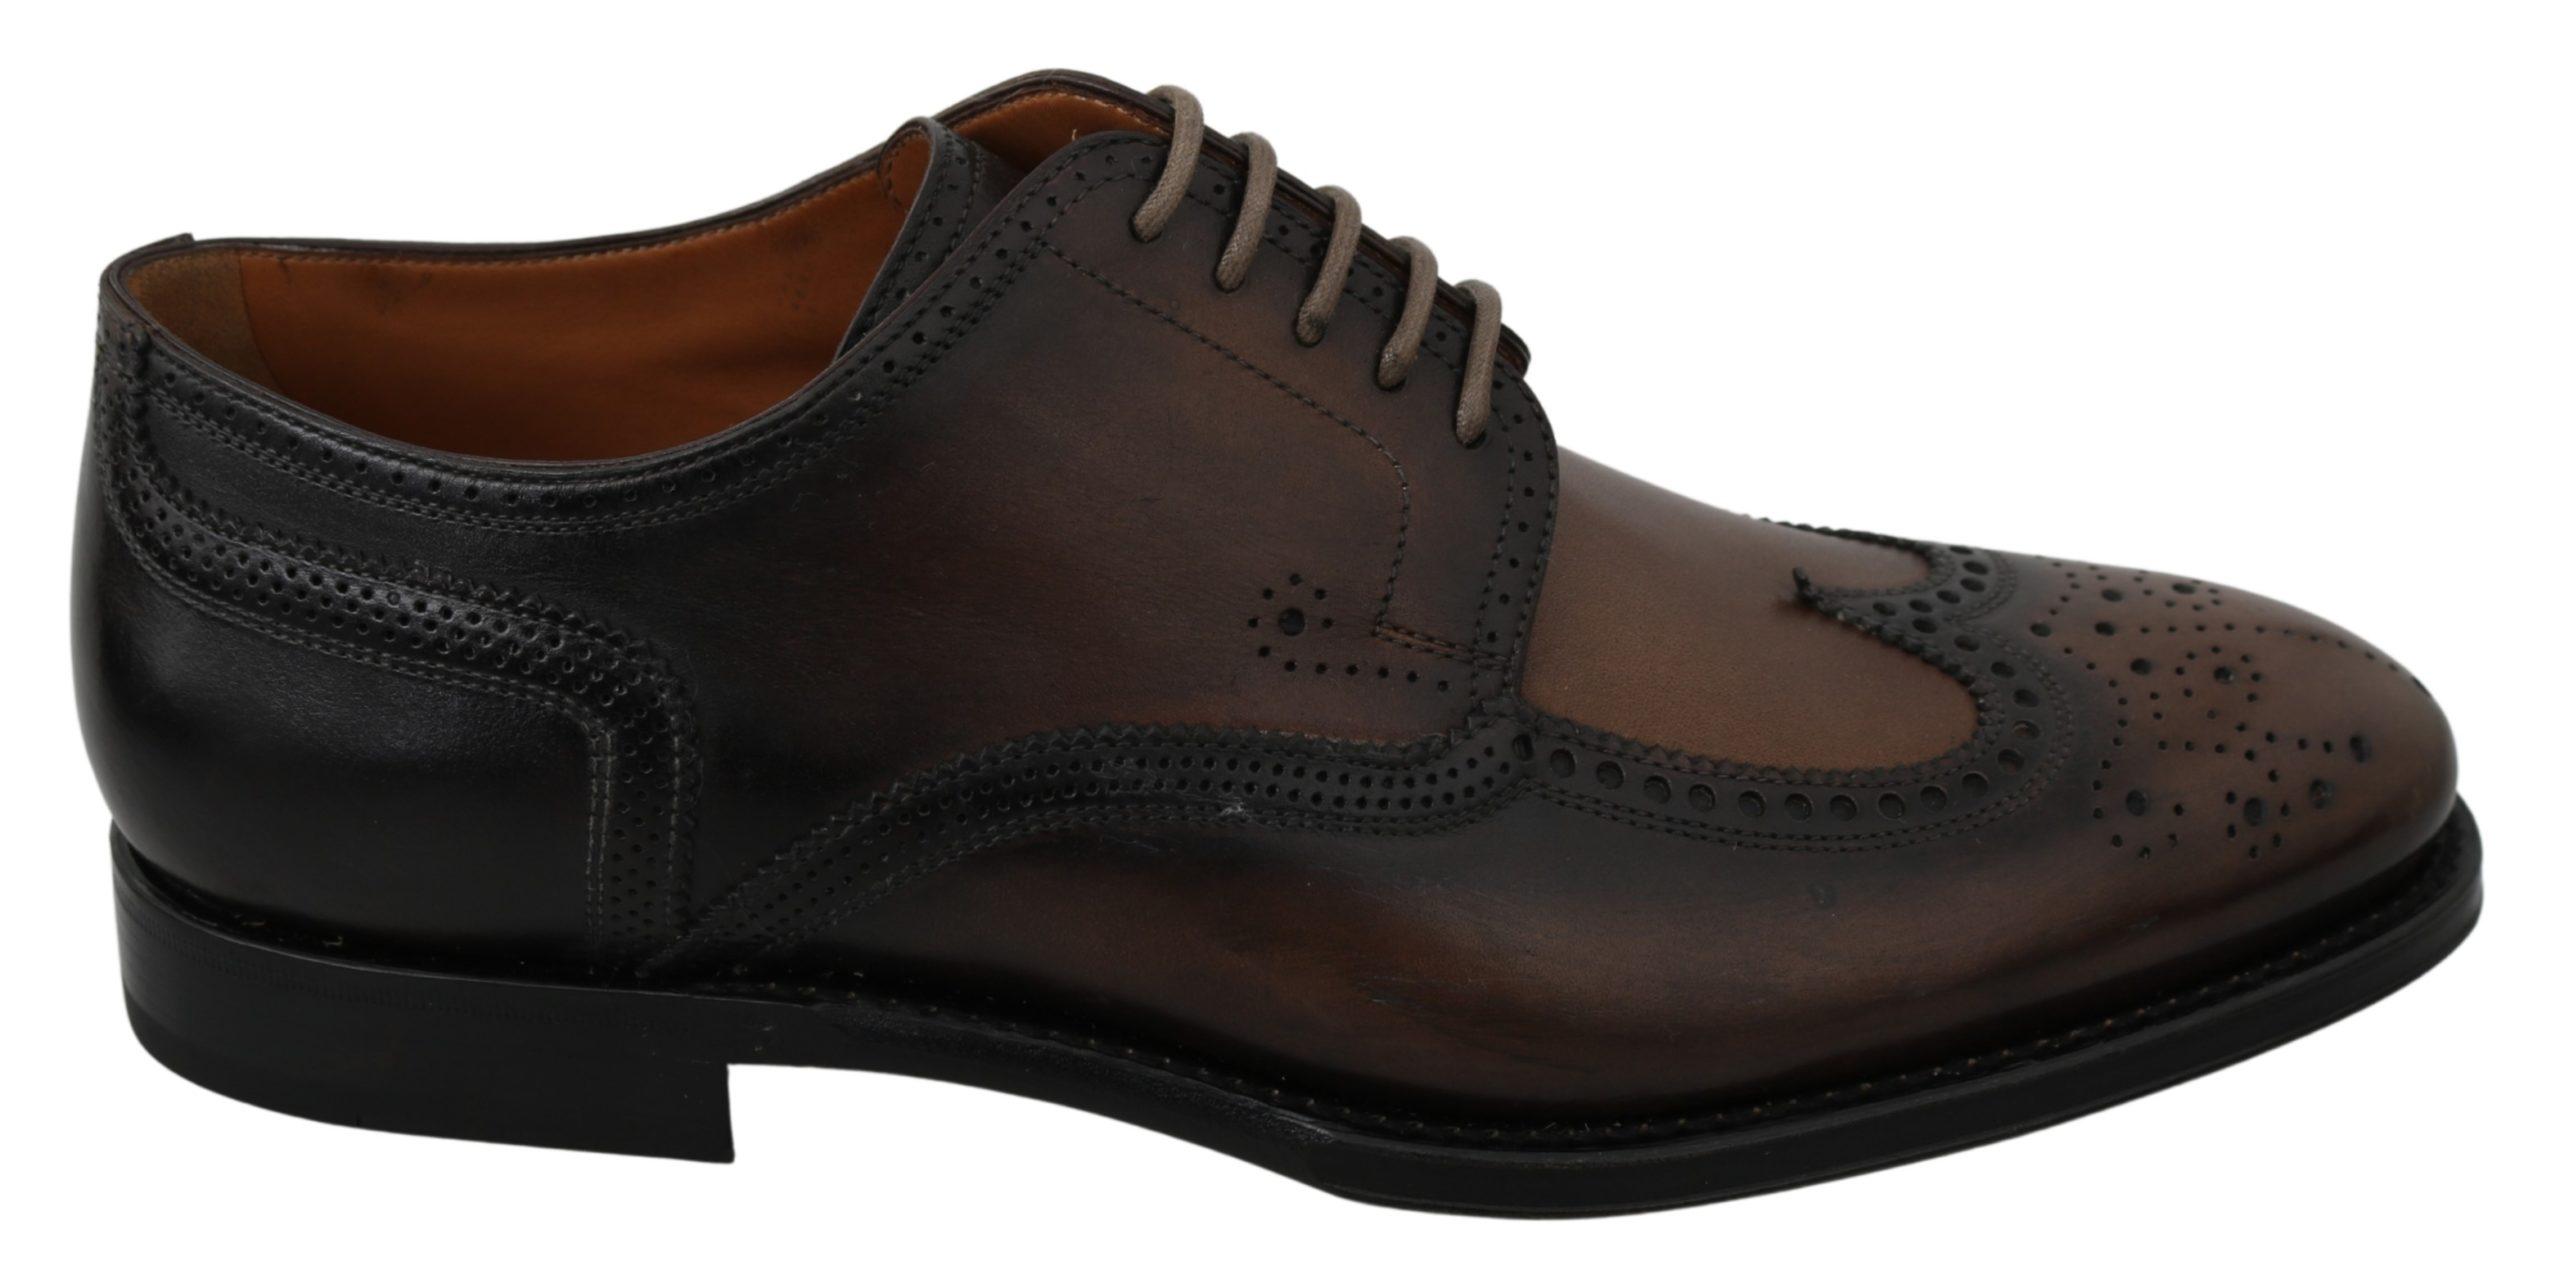 Dolce & Gabbana Men's Leather Formal Brogue Shoe Multicolor MV2887 - EU42/US9